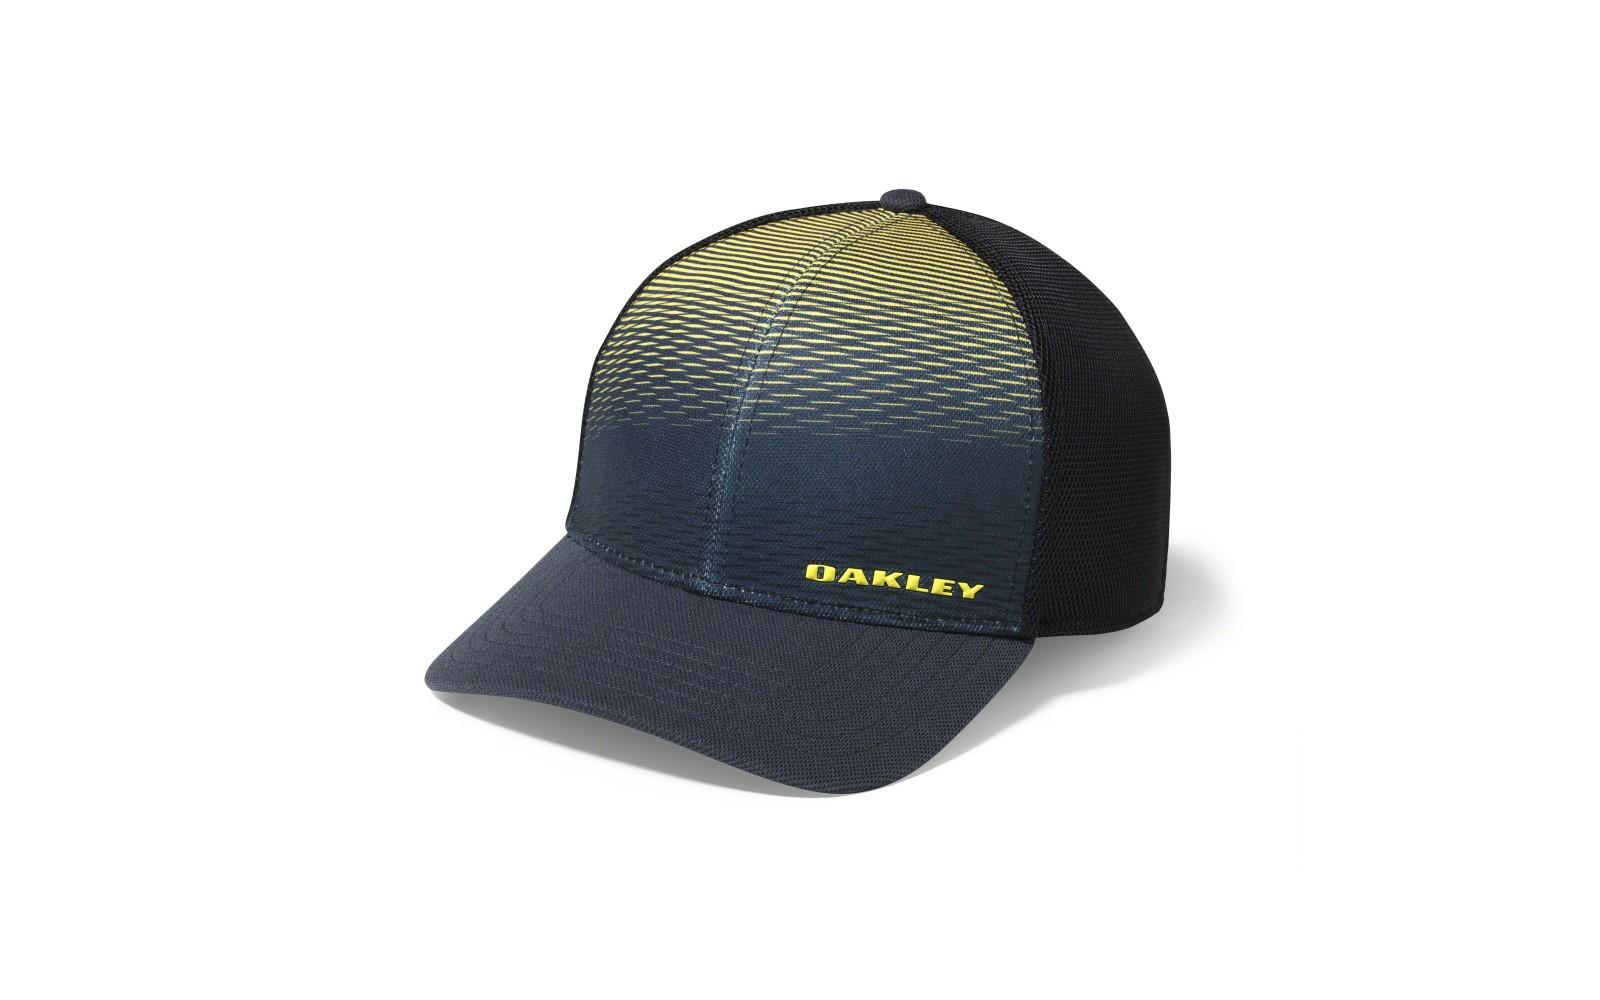 Oakley Silicon Bark Trucker 4.0 Print Pet - S/M - 911021P-00N